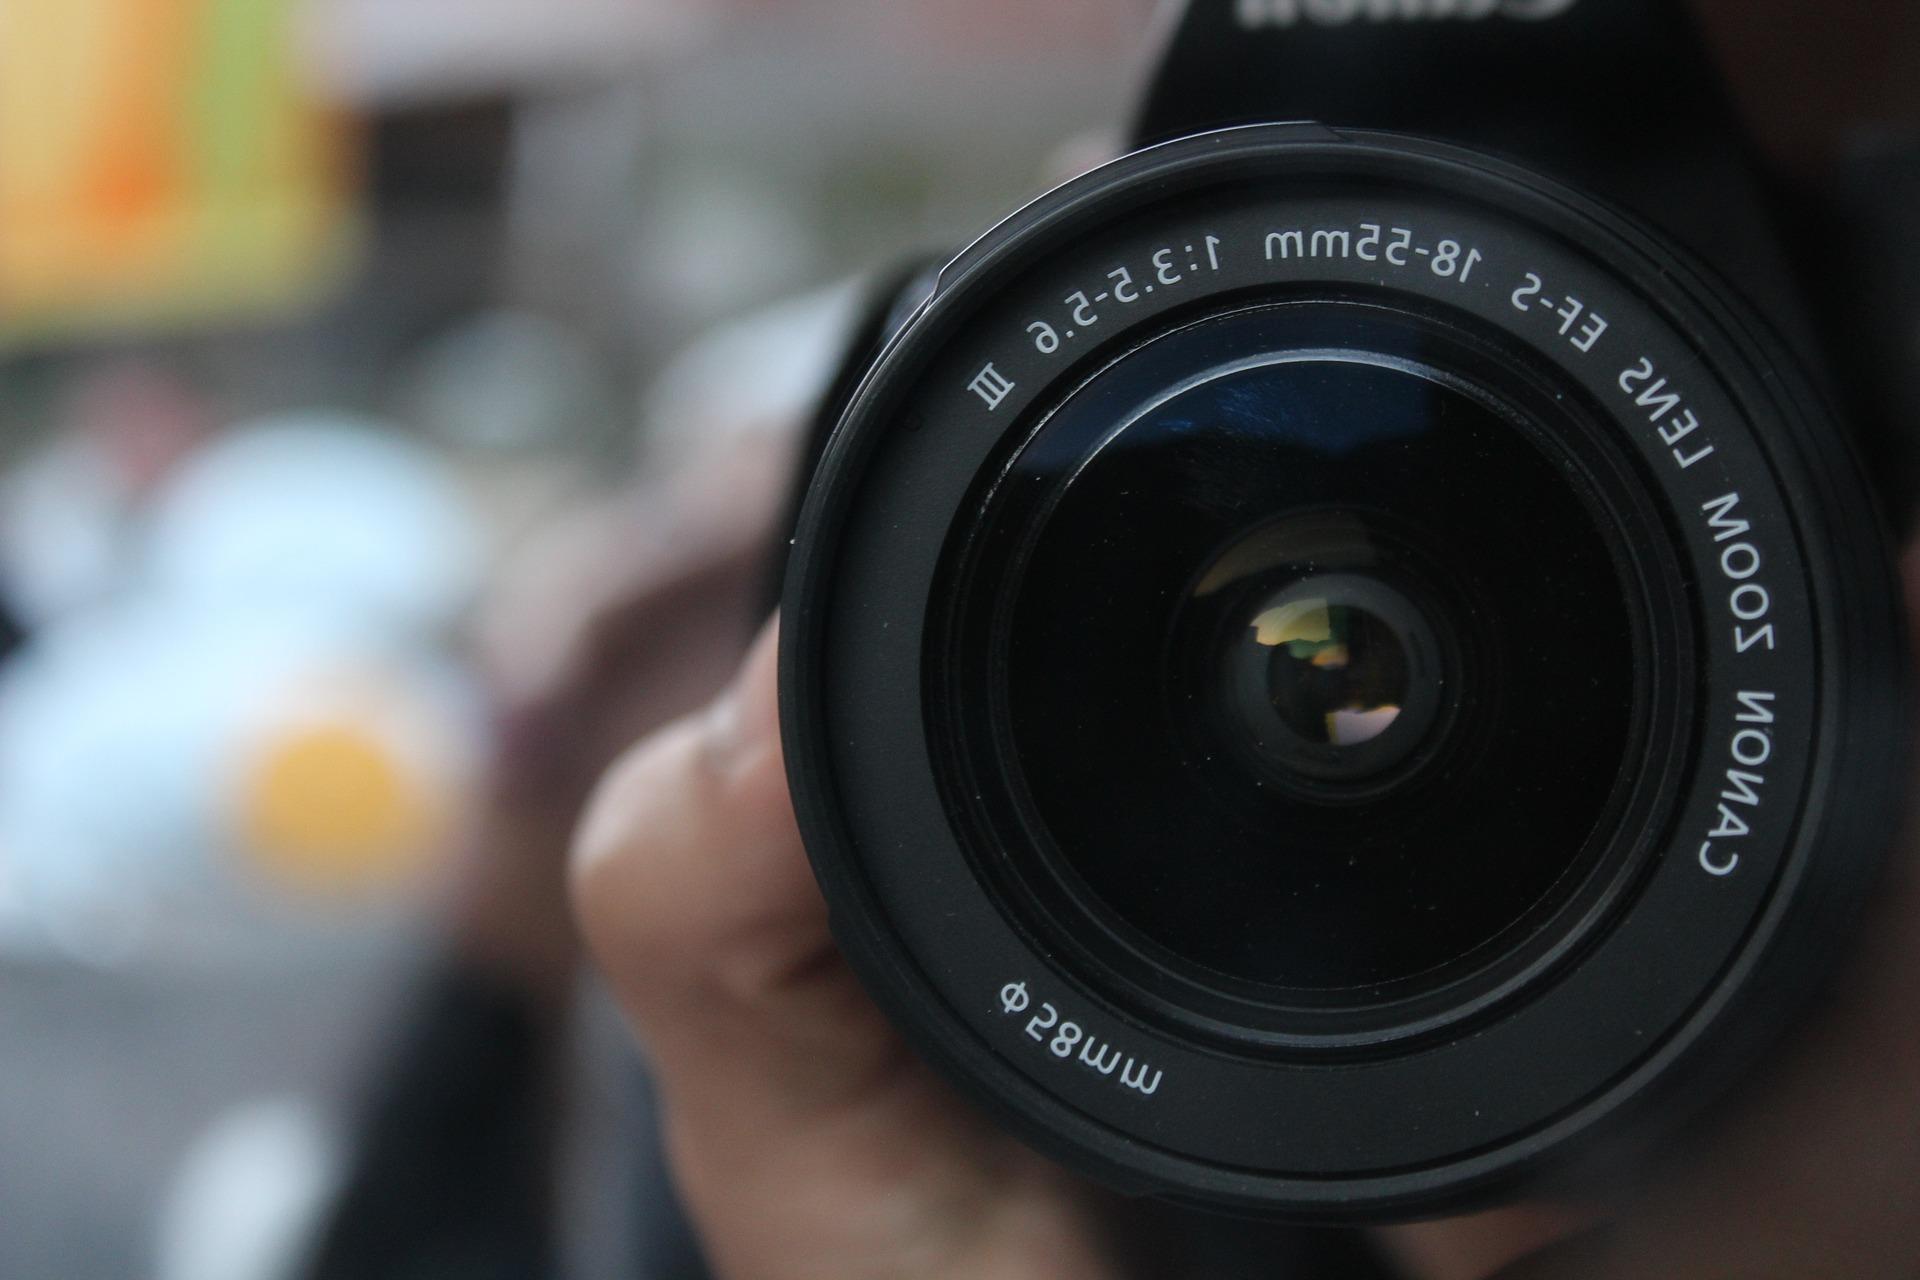 Canon一眼レフおすすめ中古カメラ6選!初心者にも買いやすいレンズと合わせて予算5万〜10万編